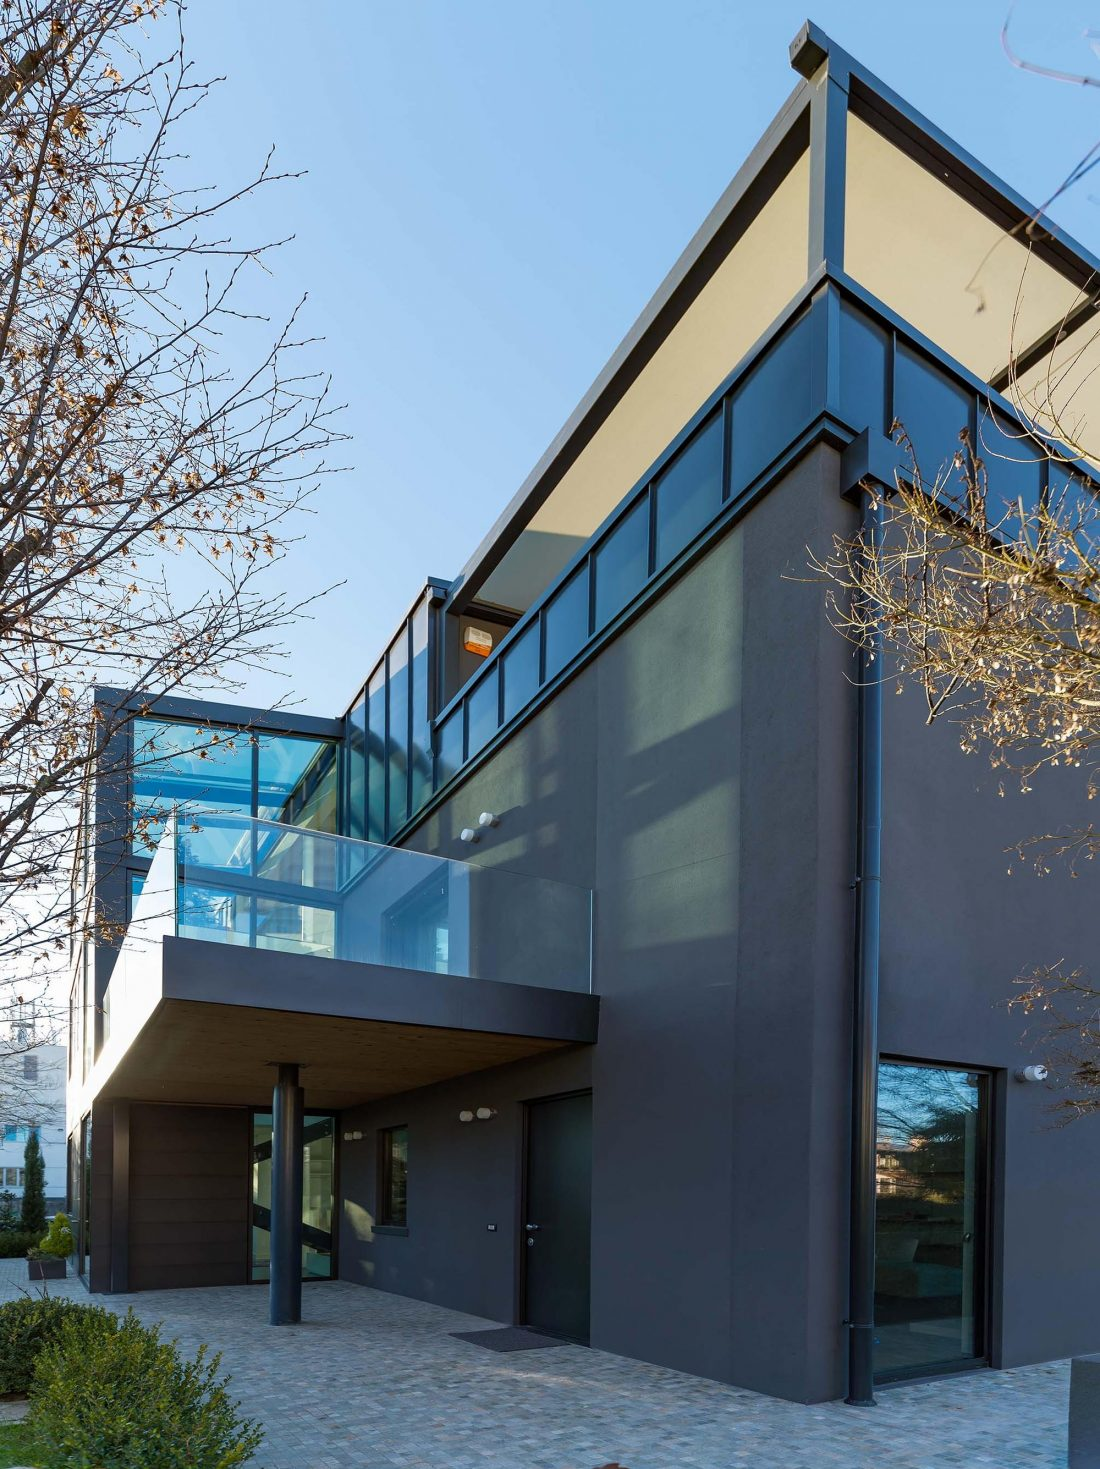 Дом в Порденоне, Италия, от студии Caprioglio Associati Architects 36